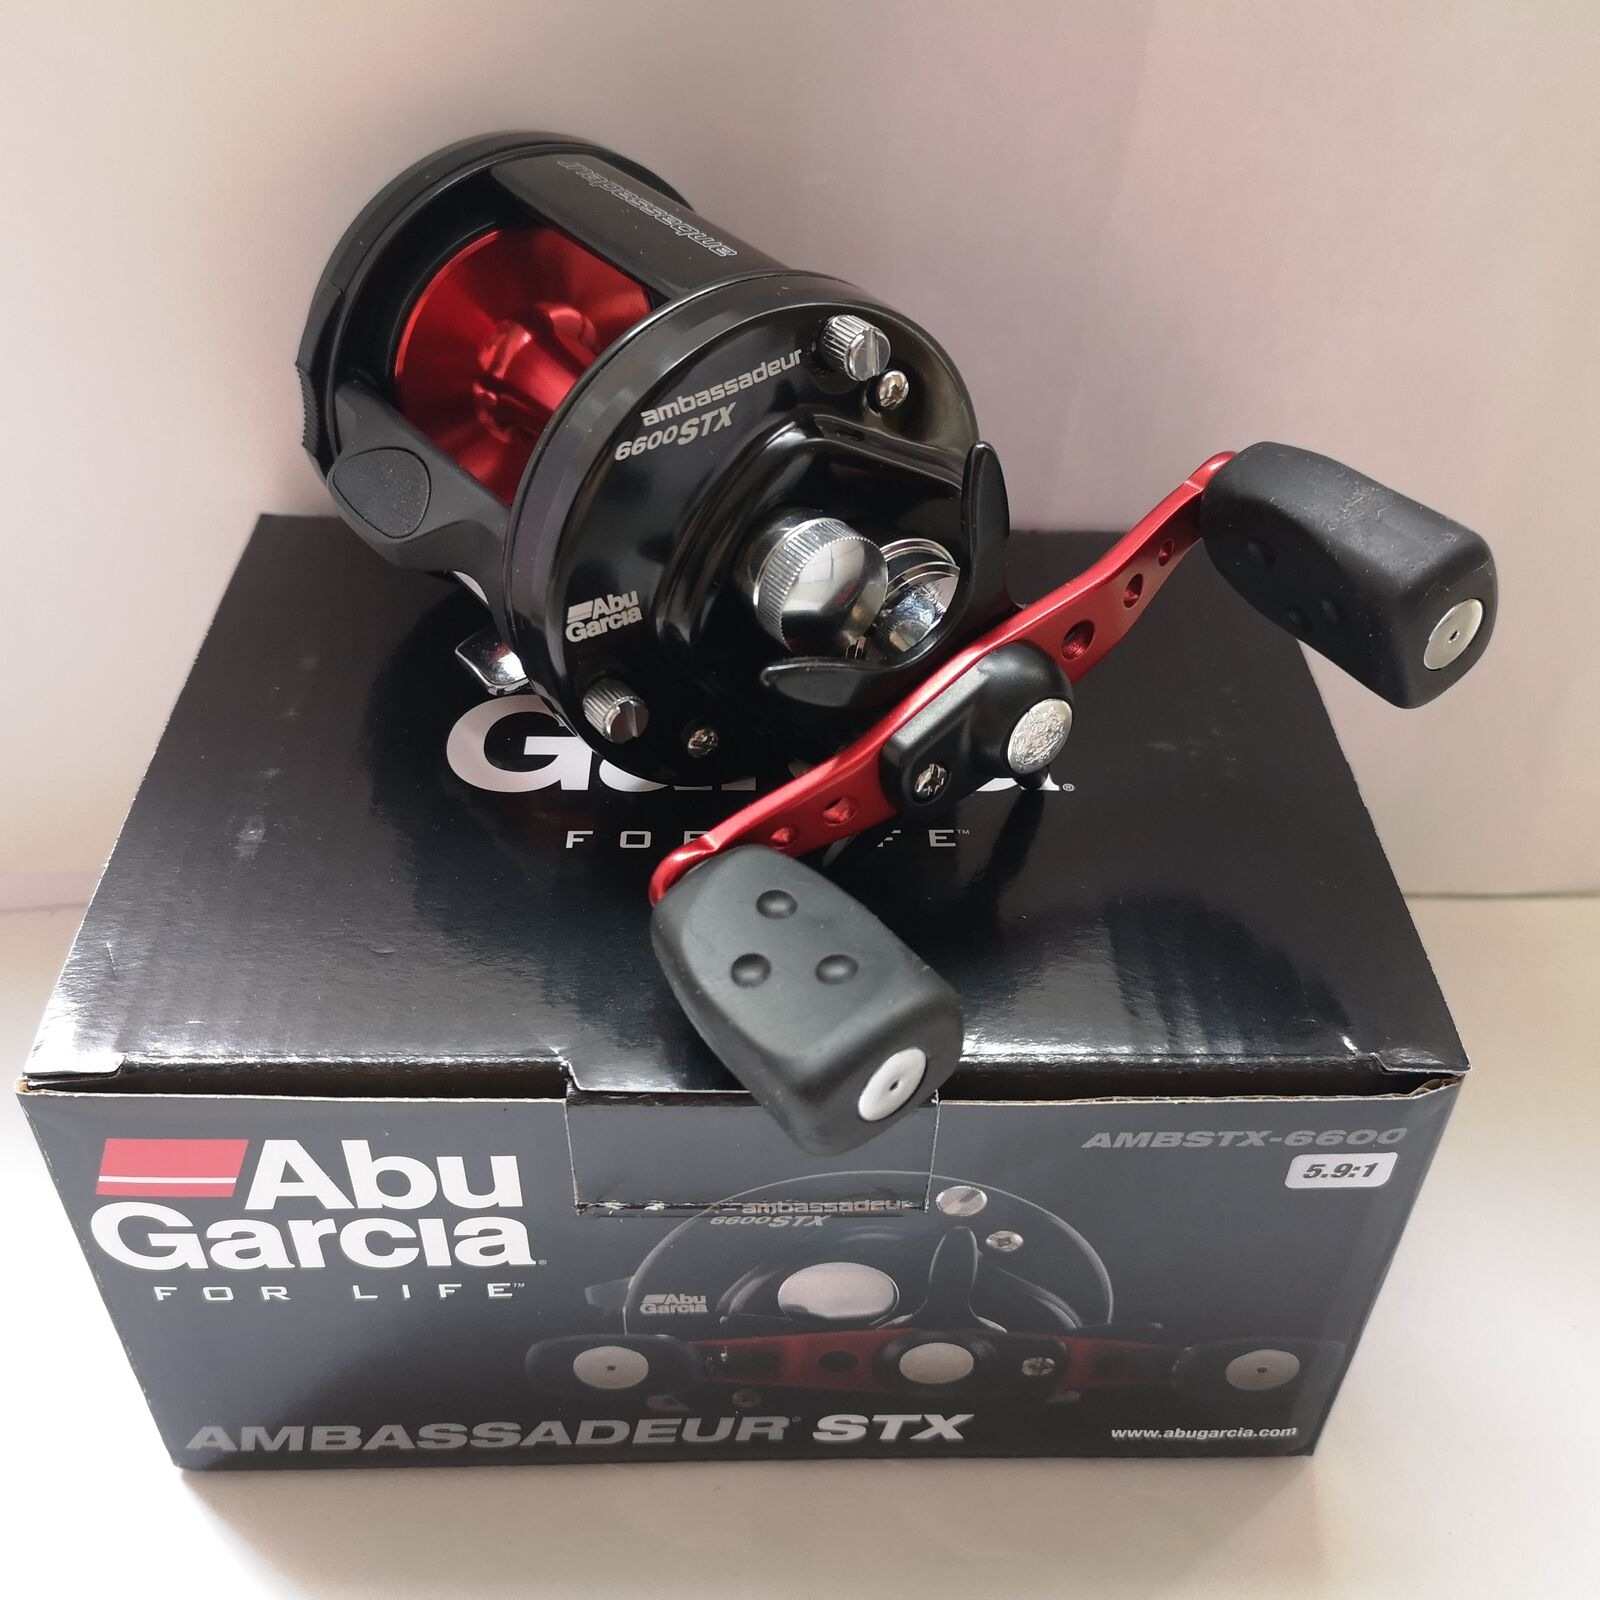 Abu Garcia Ambassadeur STX 6600 Round Baitcast Reel 5.9 1 Ratio  1292726